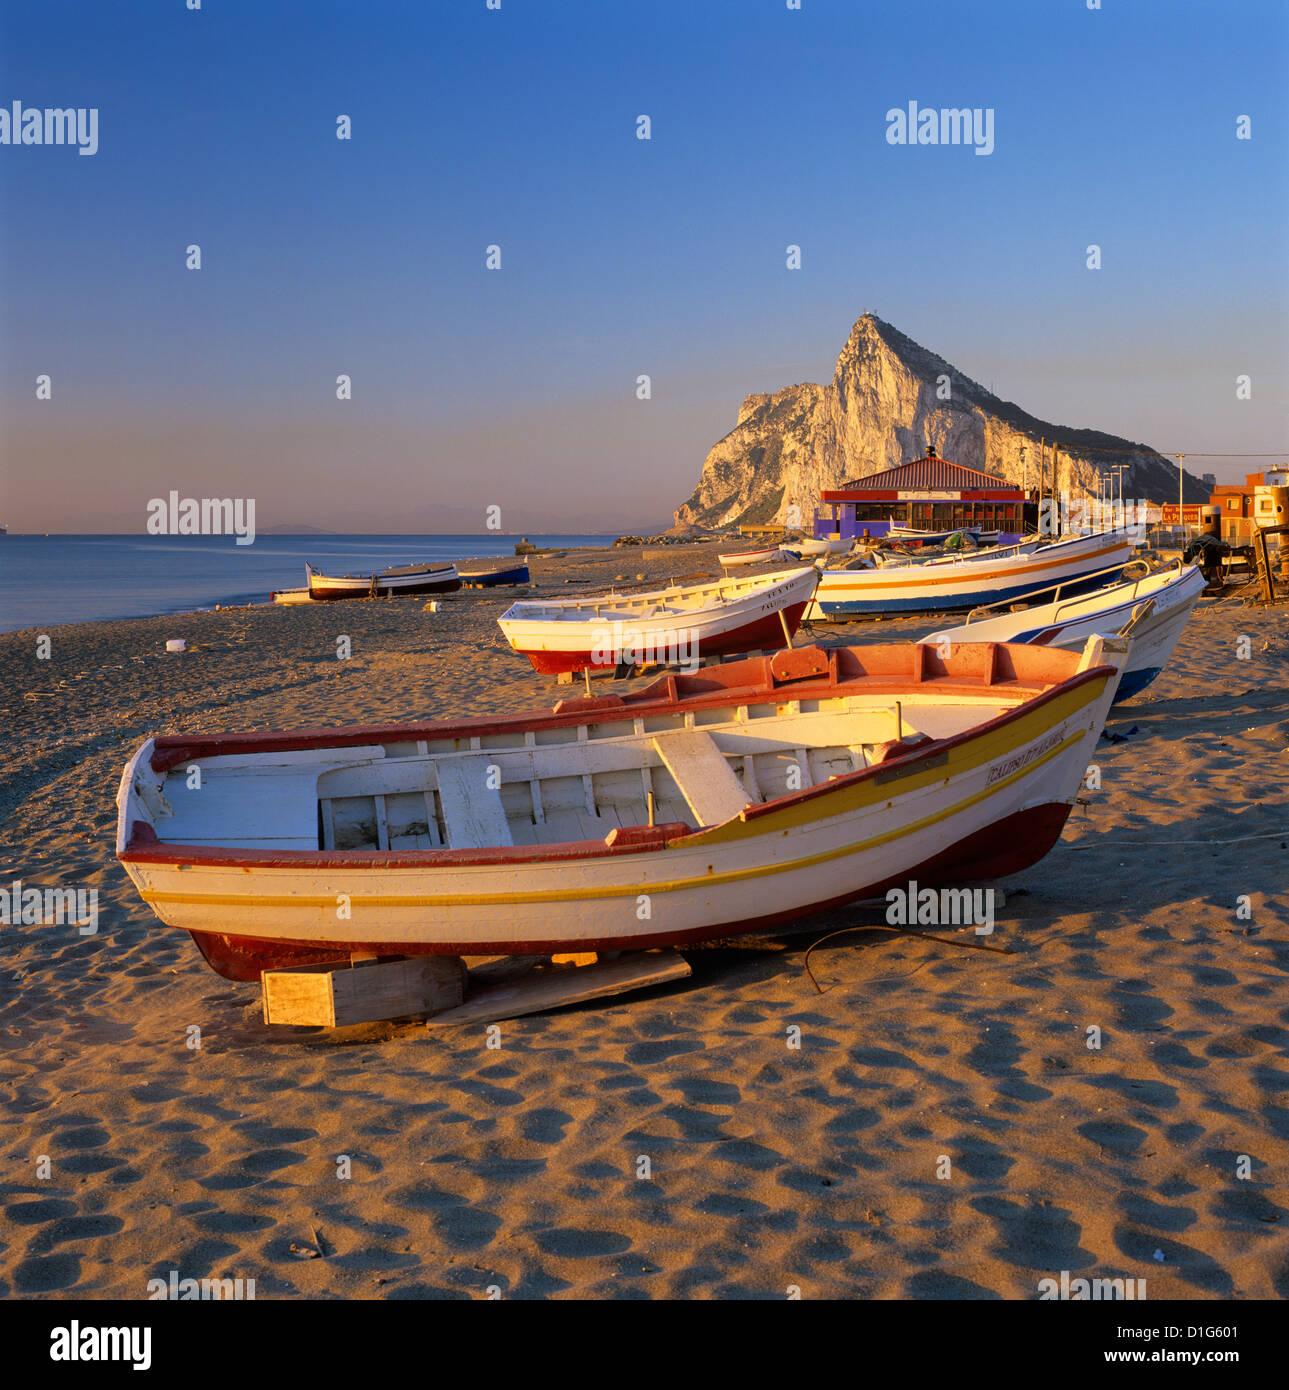 Gibraltar gesehen am Strand, La Linea, Andalusien, Spanien, Mittelmeer, Europa Stockbild